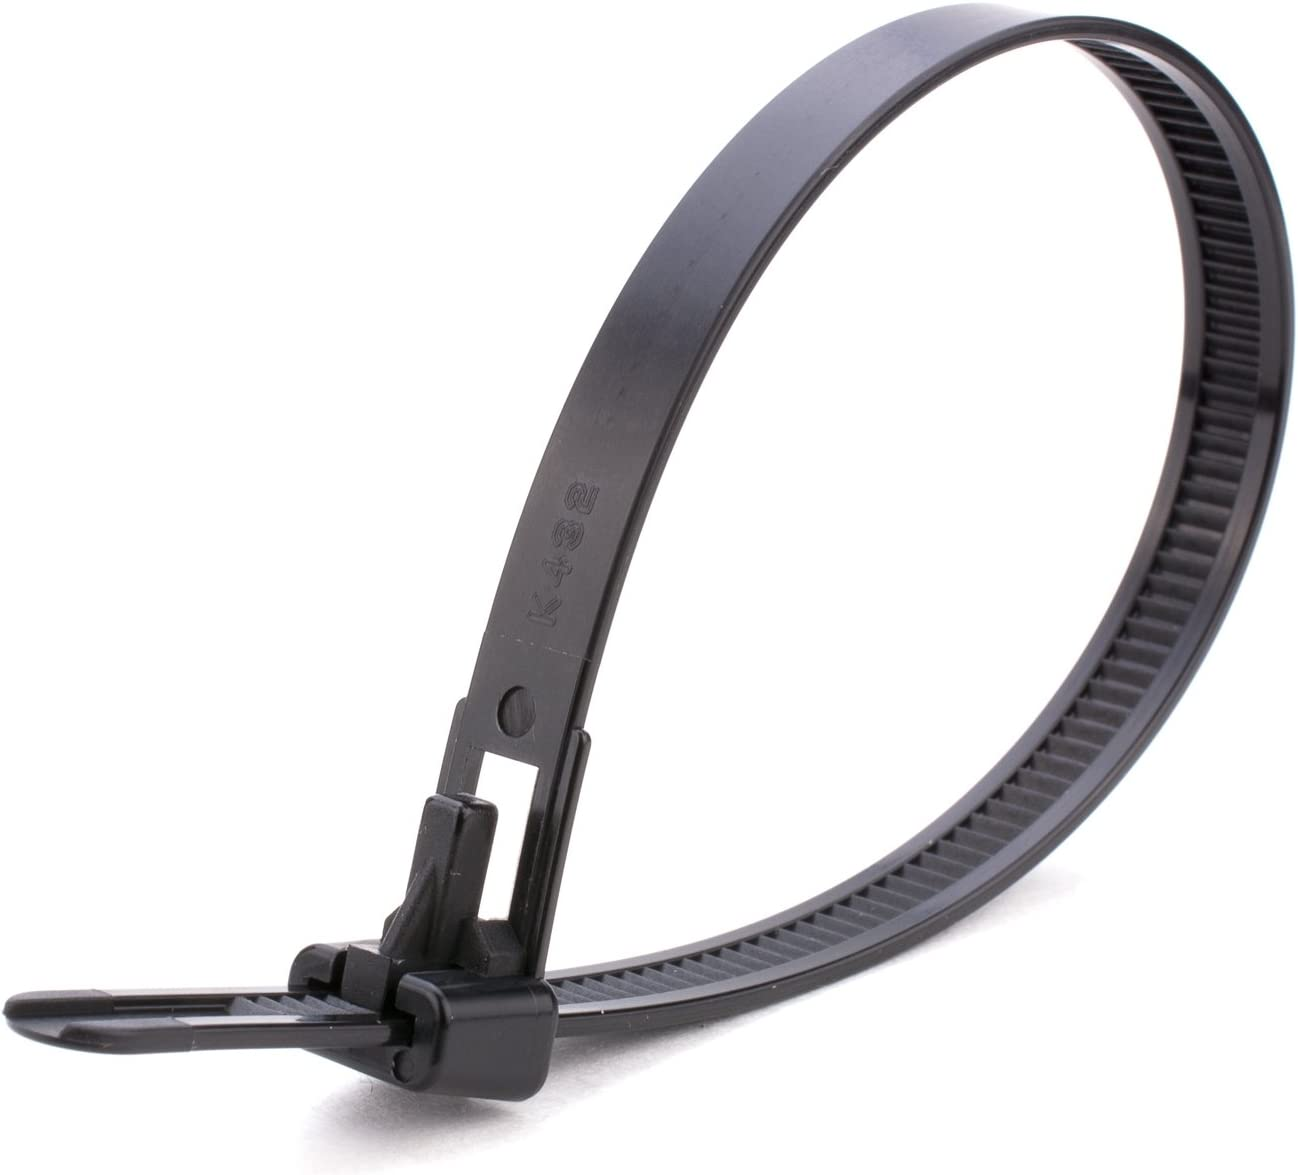 Gocableties - Lote de 100 bridas resistentes para cables (250 x 7,6 mm, reutilizables, 250 x 7,6 mm), color negro